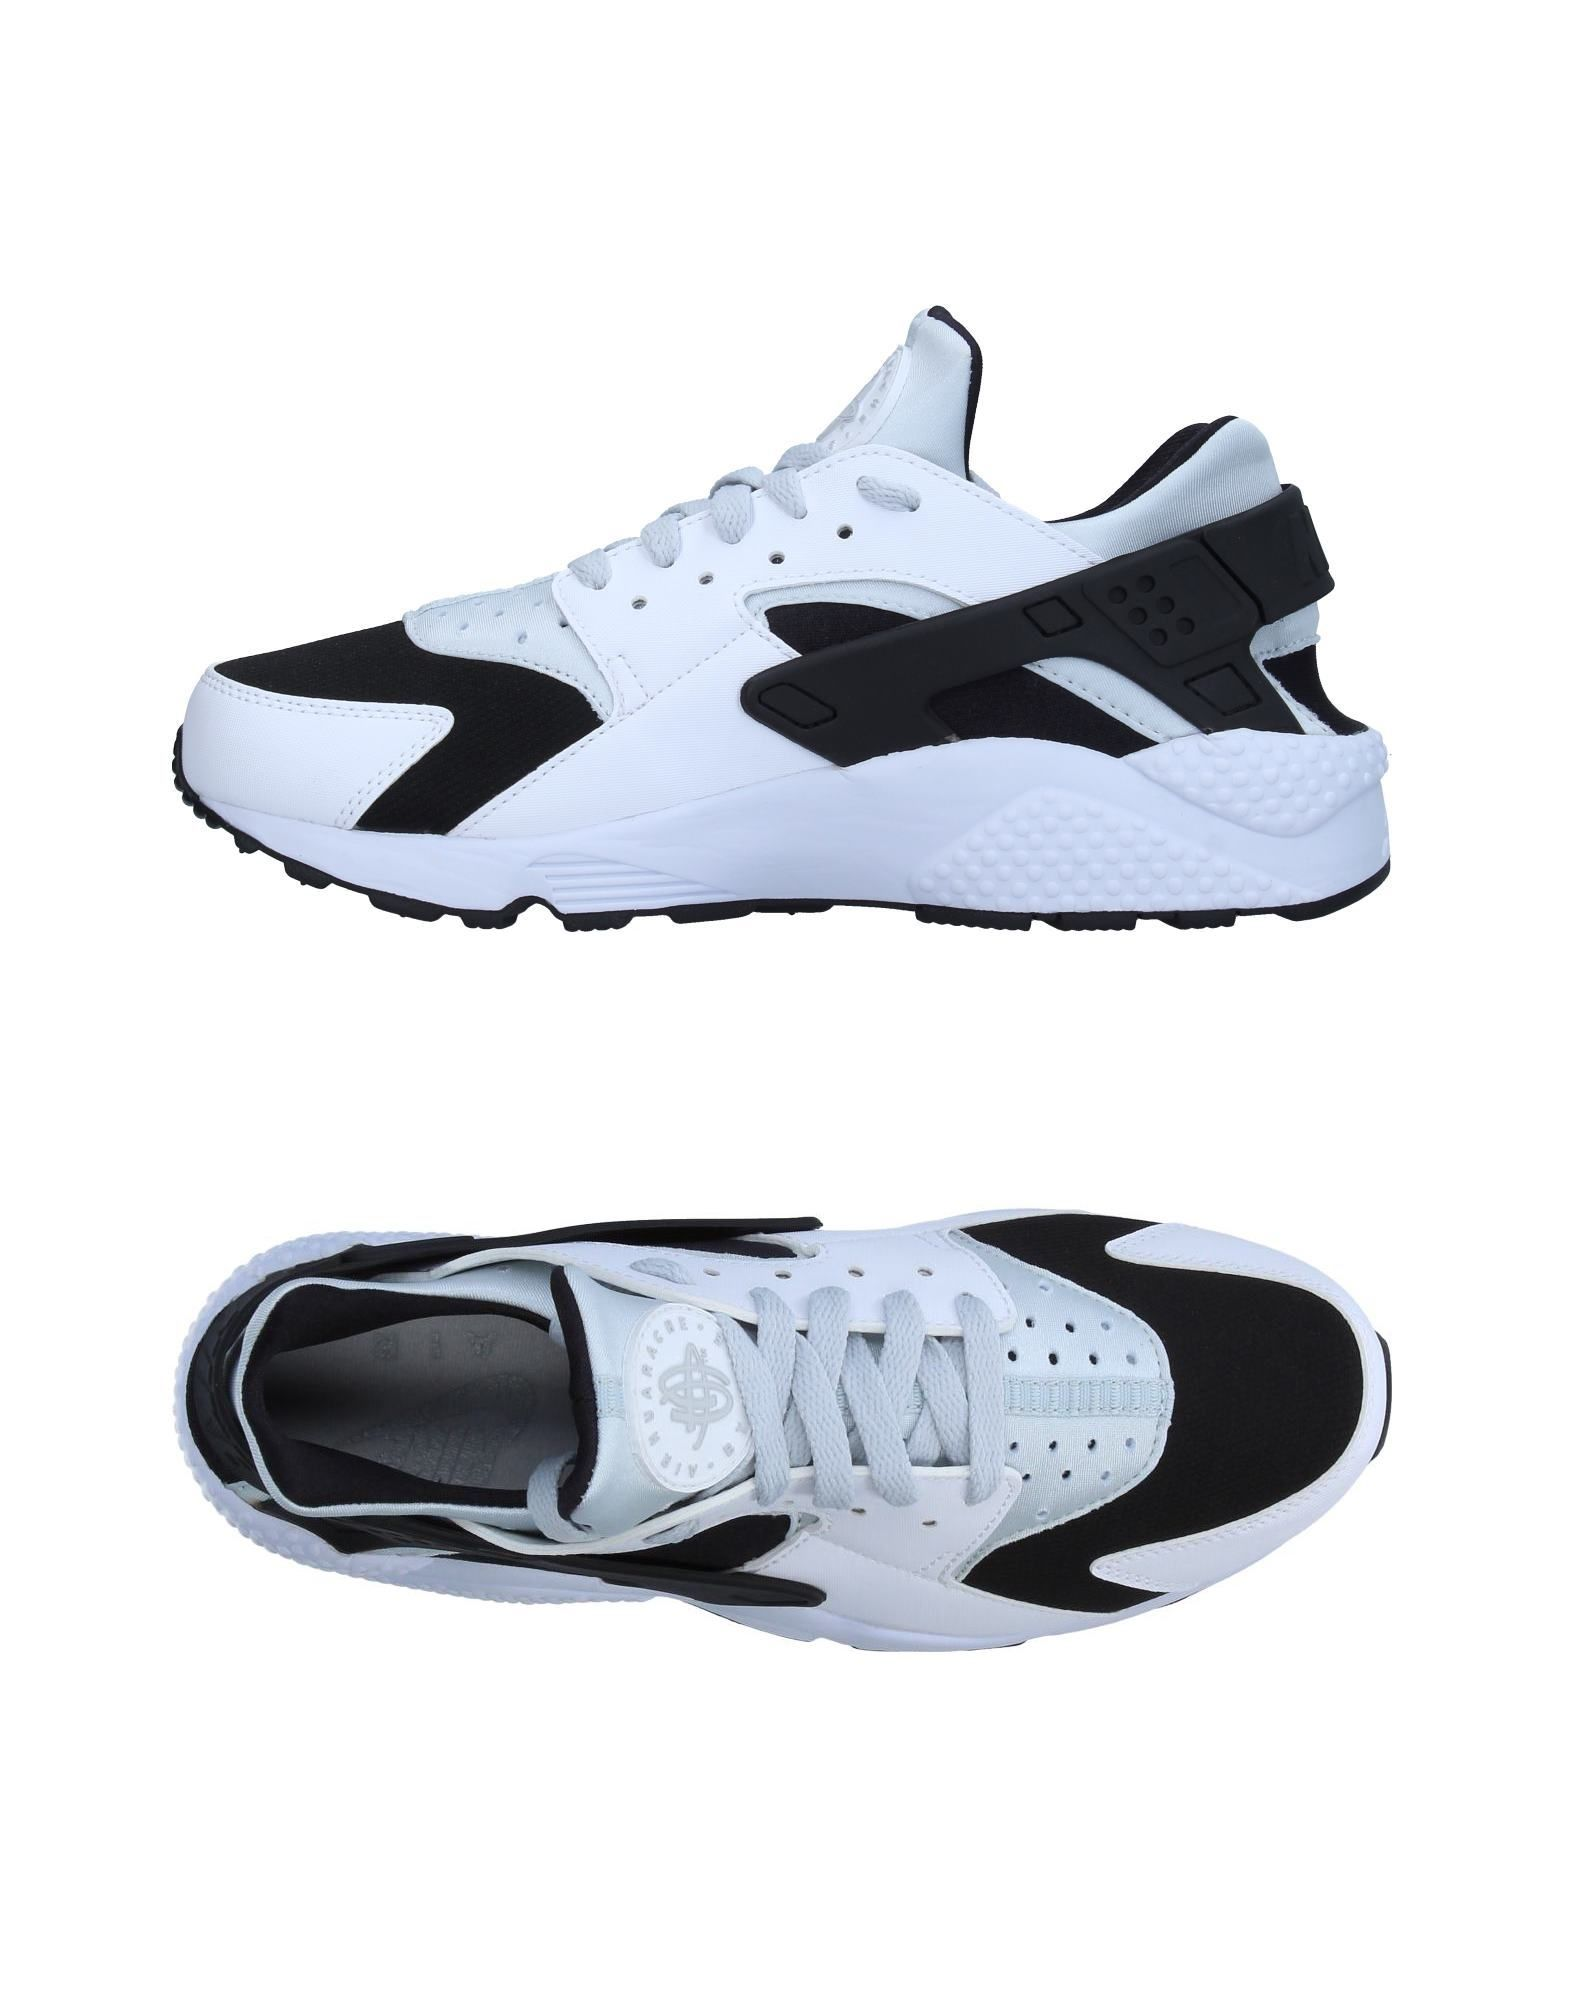 Moda Ginnastica Scarpe da Ginnastica Moda Nike Uomo - 11336737JV 660f18